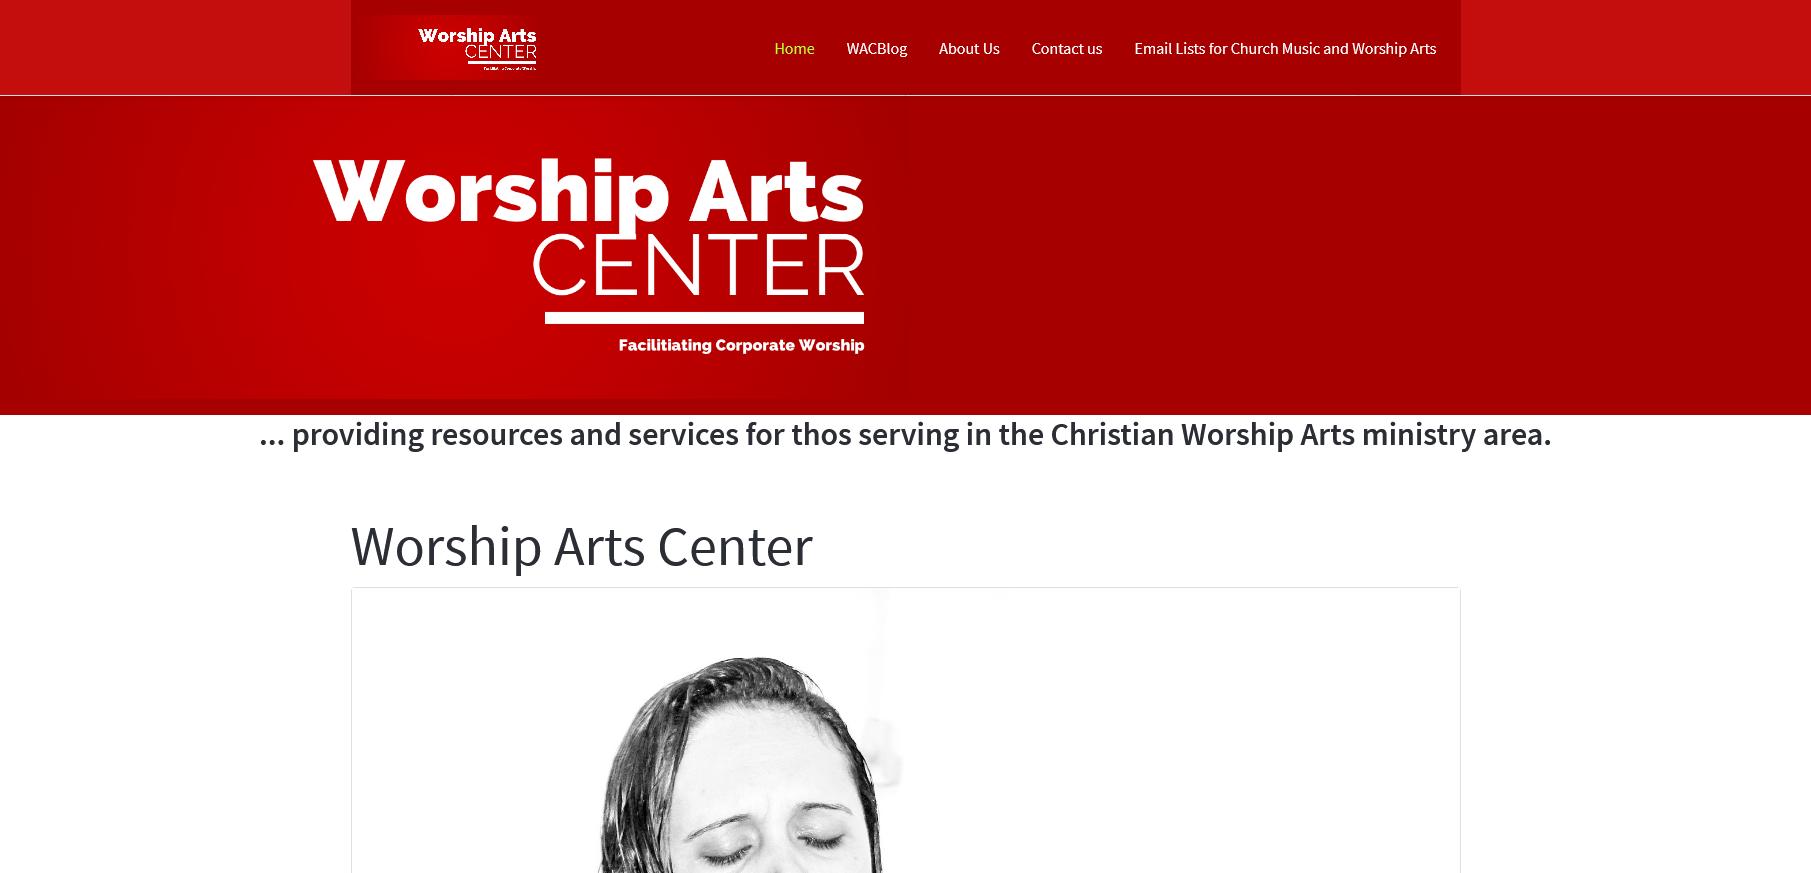 Worship Arts Center